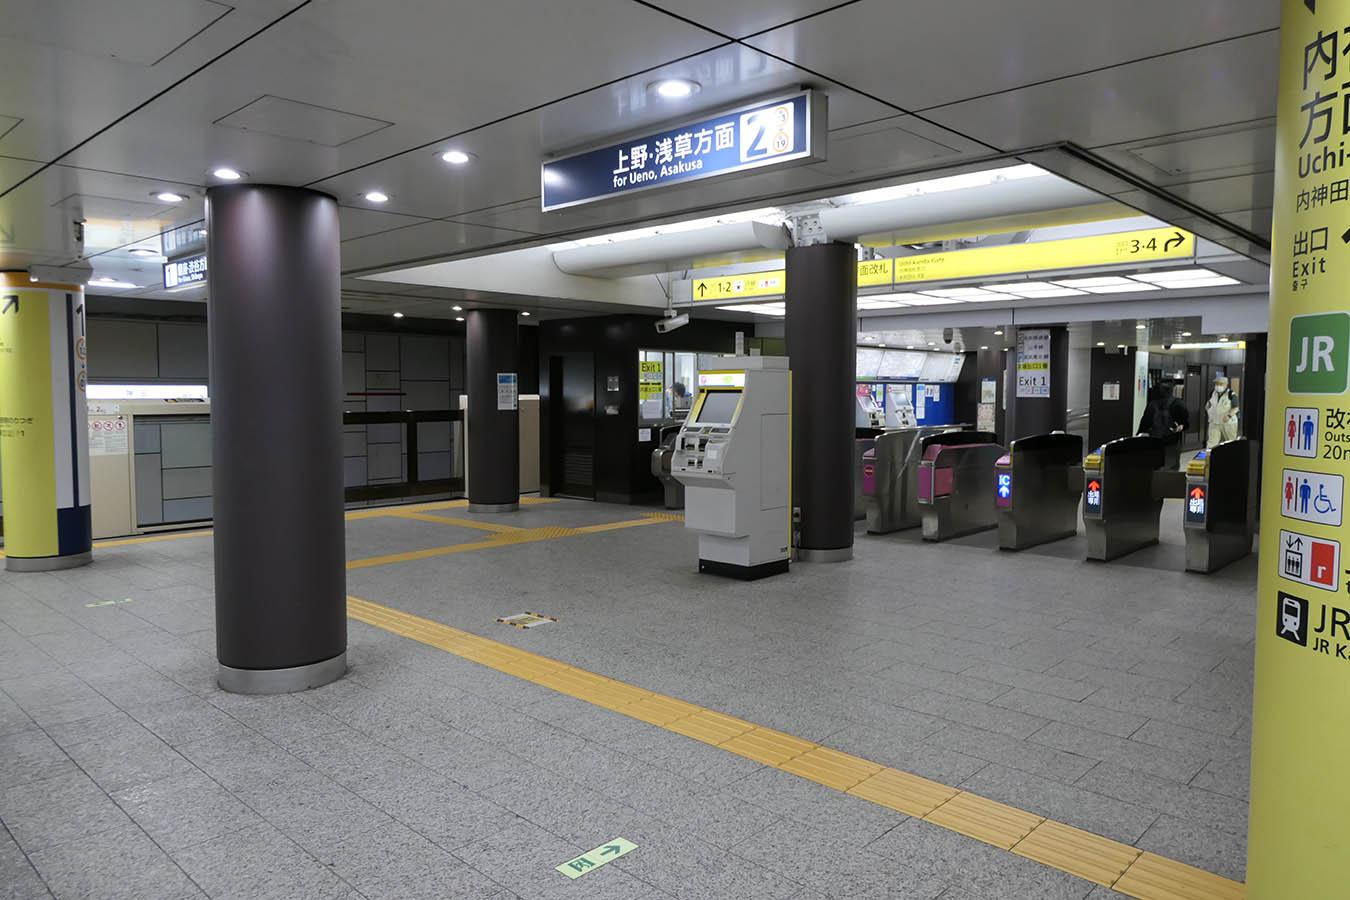 G13_photo04.jpg